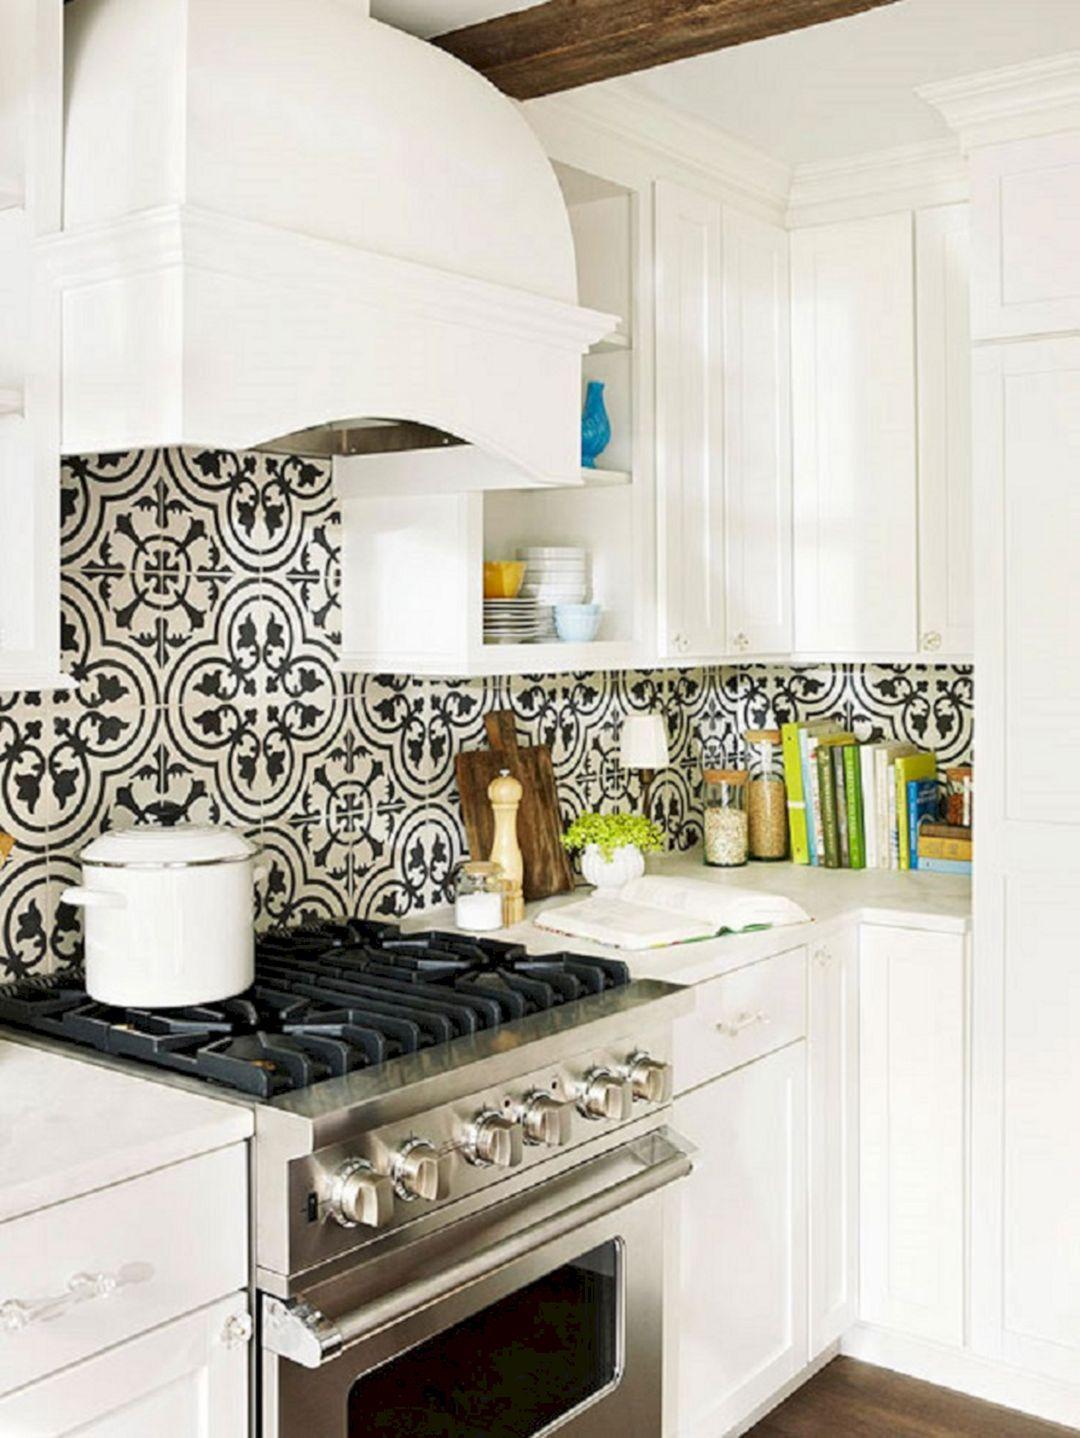 Top 28 Glass Kitchen Backsplash Ideas For Comfortable ...